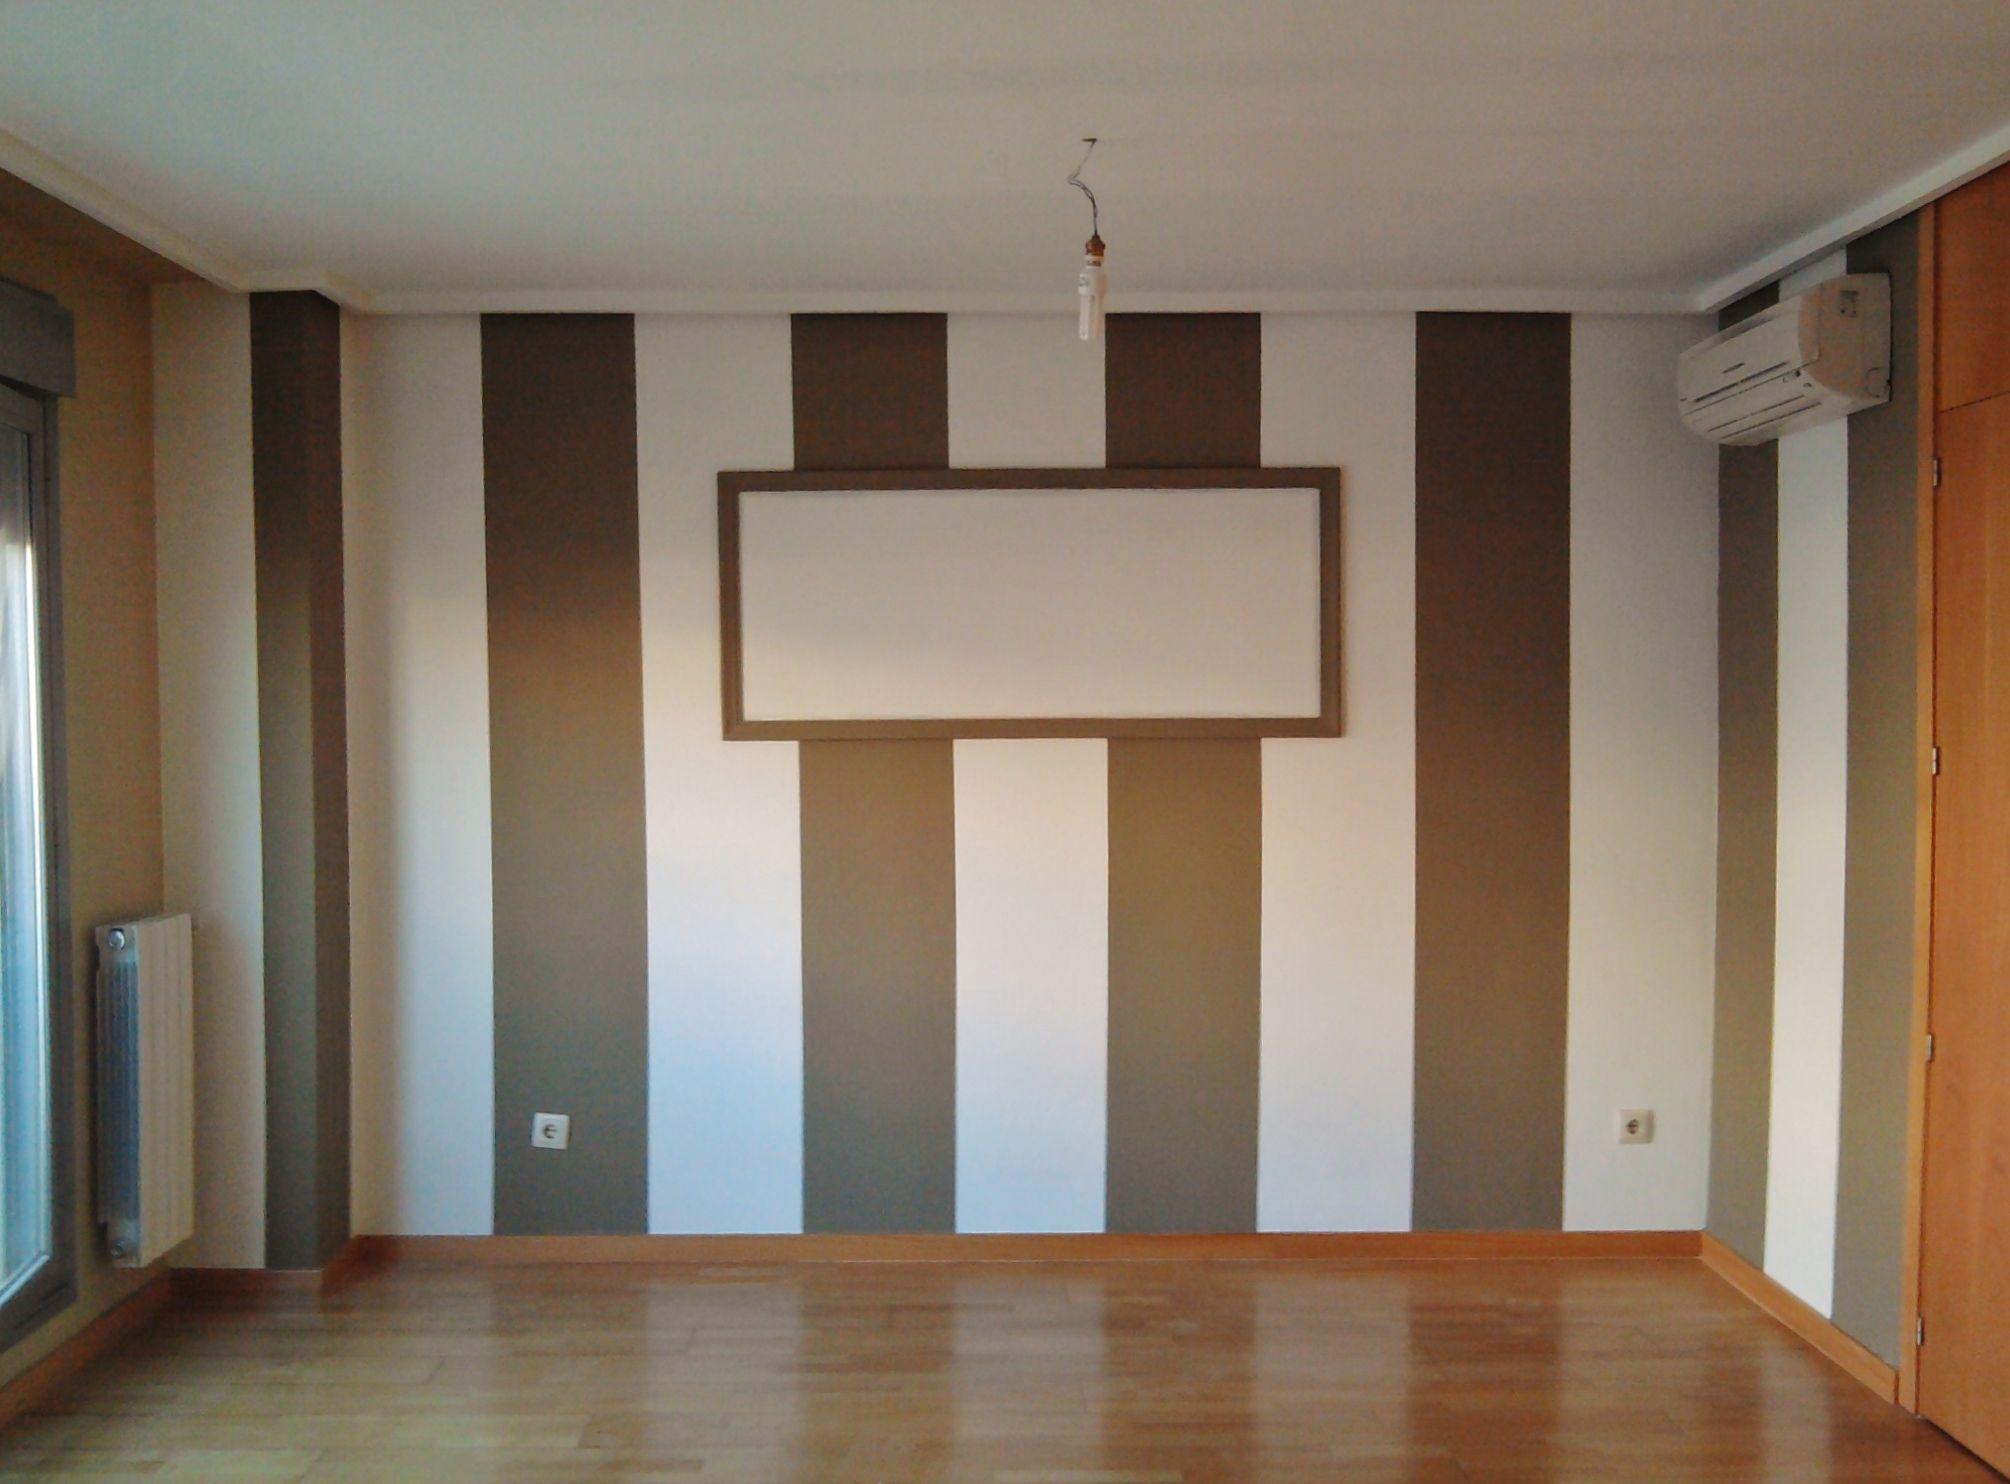 Pintura decorativa rayas dos colores decoracion paredes pintura decorativa papel - Pintura decorativa paredes ...